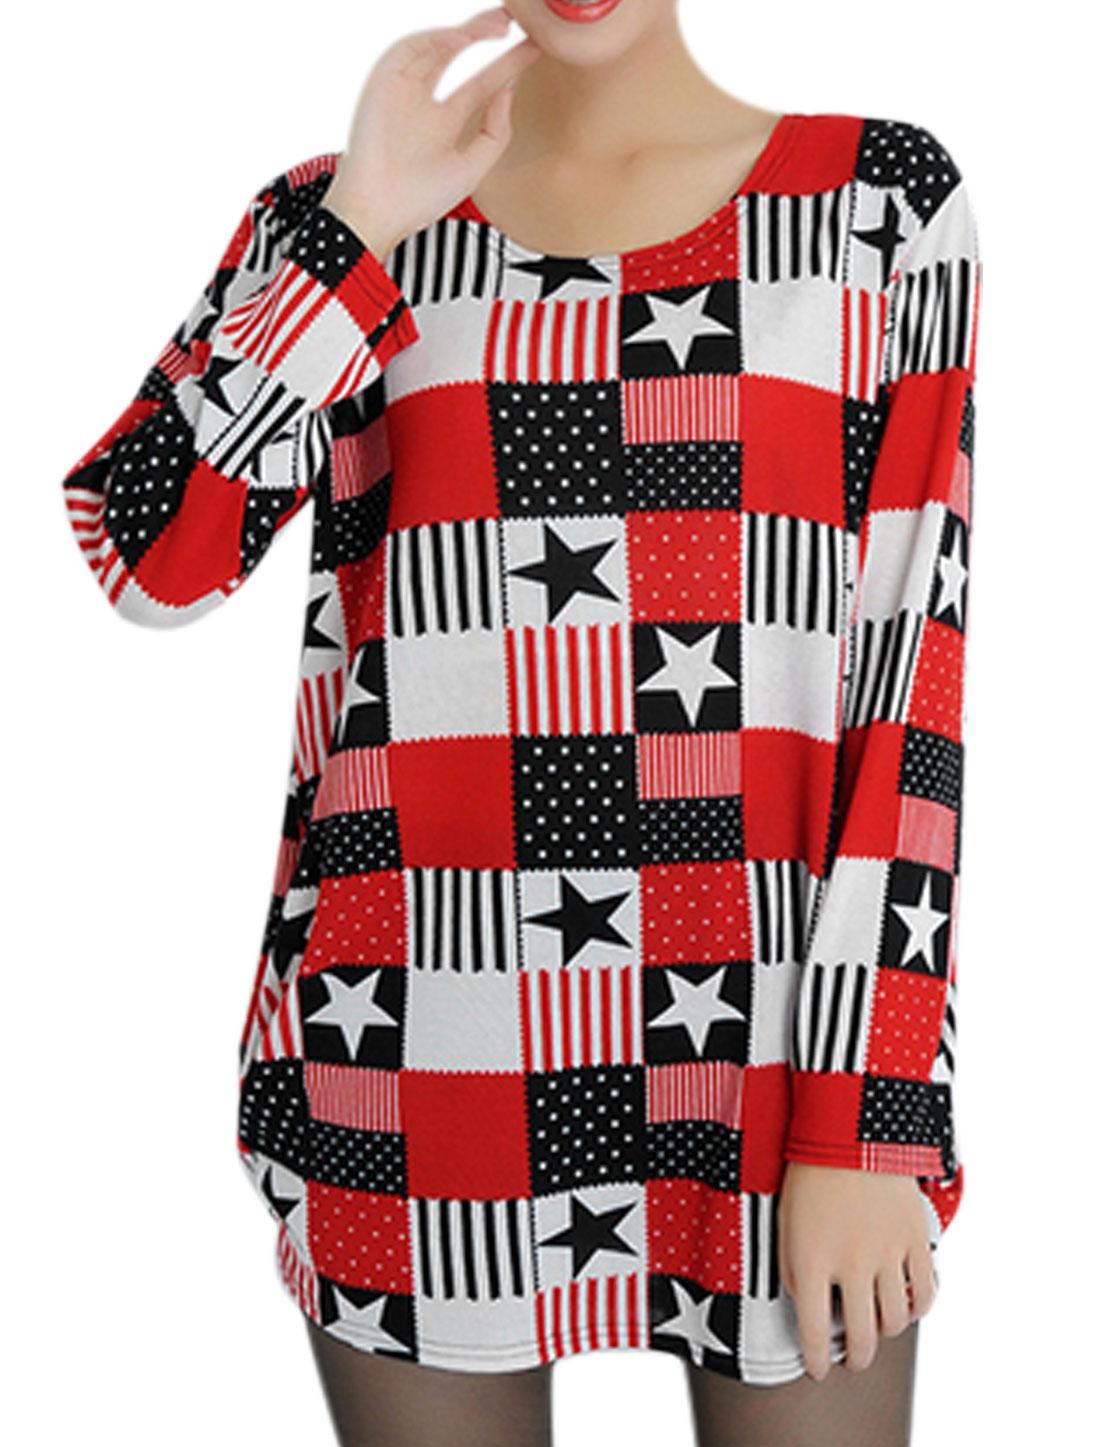 Women Stars Plaids Pattern Shirred Sides Tunic Knit Top Black Red S